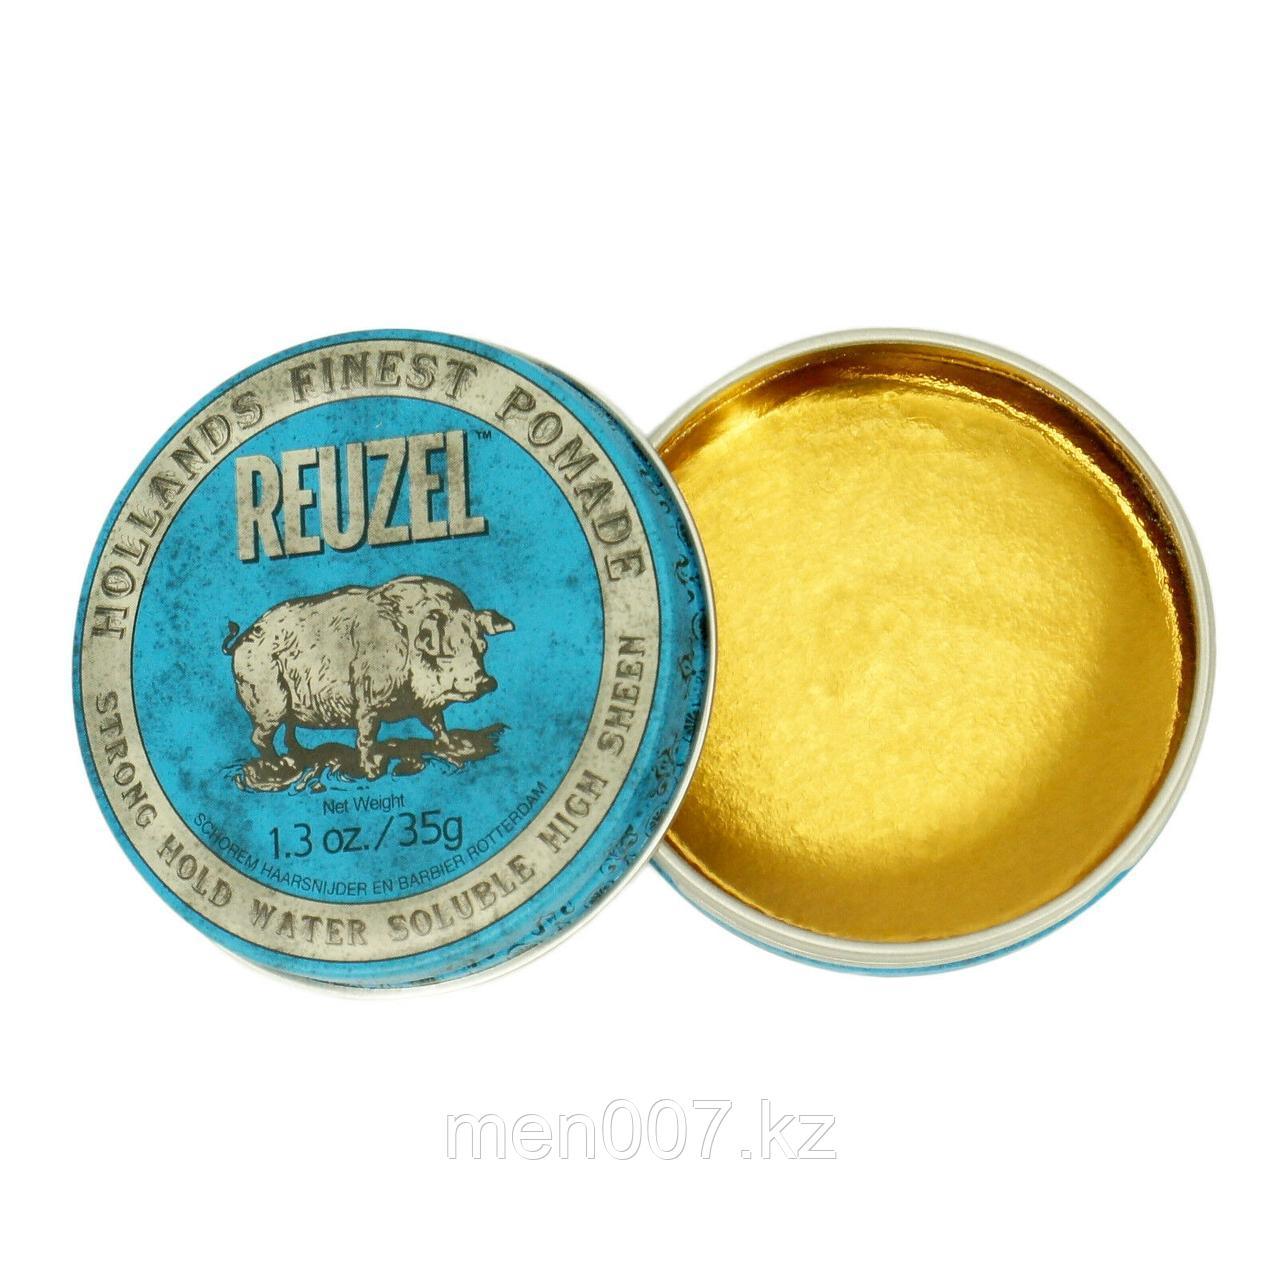 Reuzel Strong Hold Water Soluble 35 г. (помада для укладки волос)